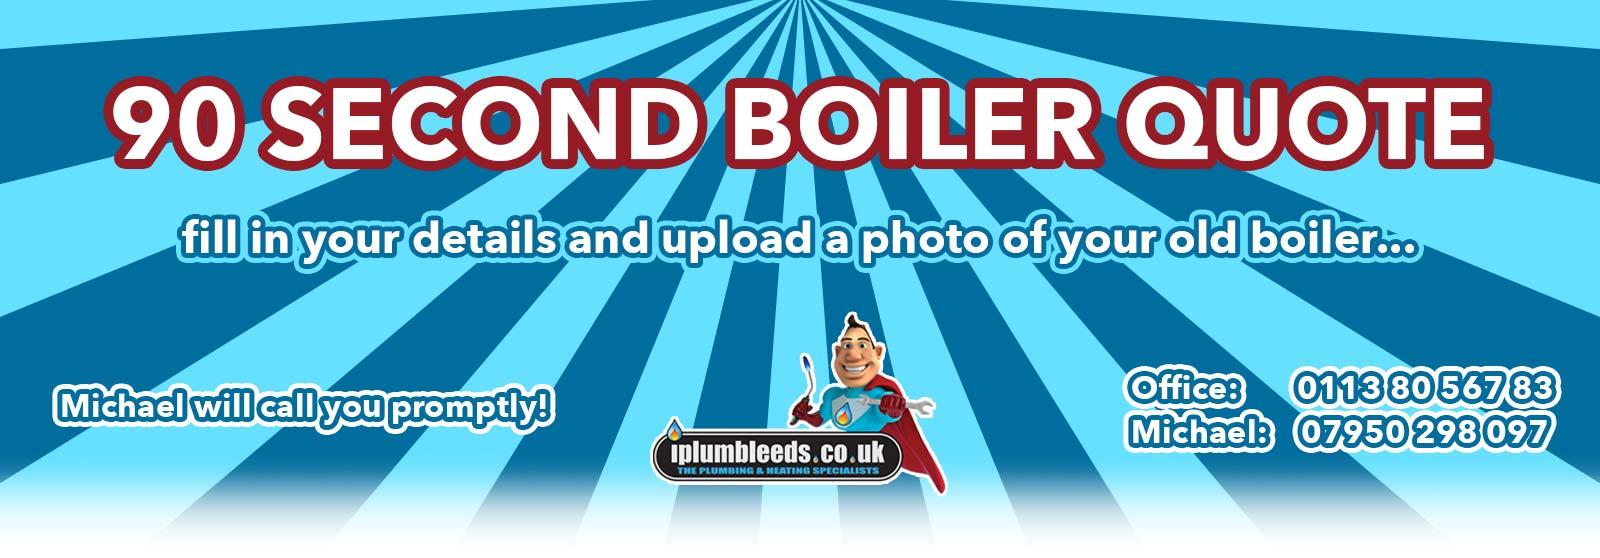 iPlumb 90 second boiler quote service